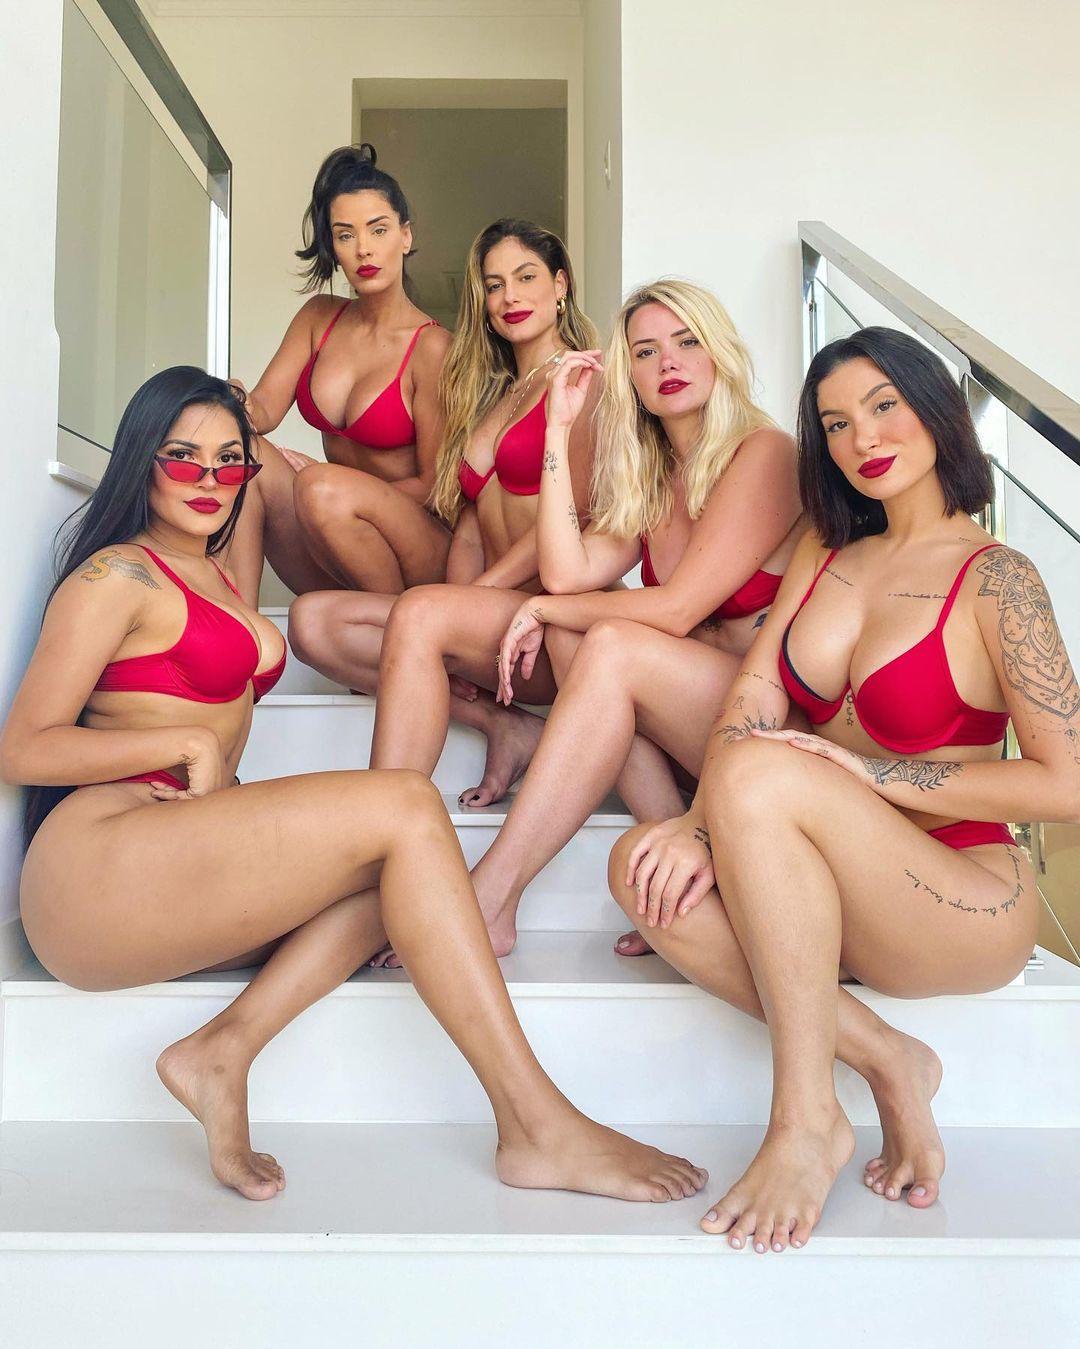 Foto das ex-BBBs Bianca Andrade, Mari Gonzales, Marcela Mcgowan, Flayslane e Ivy Moraes.